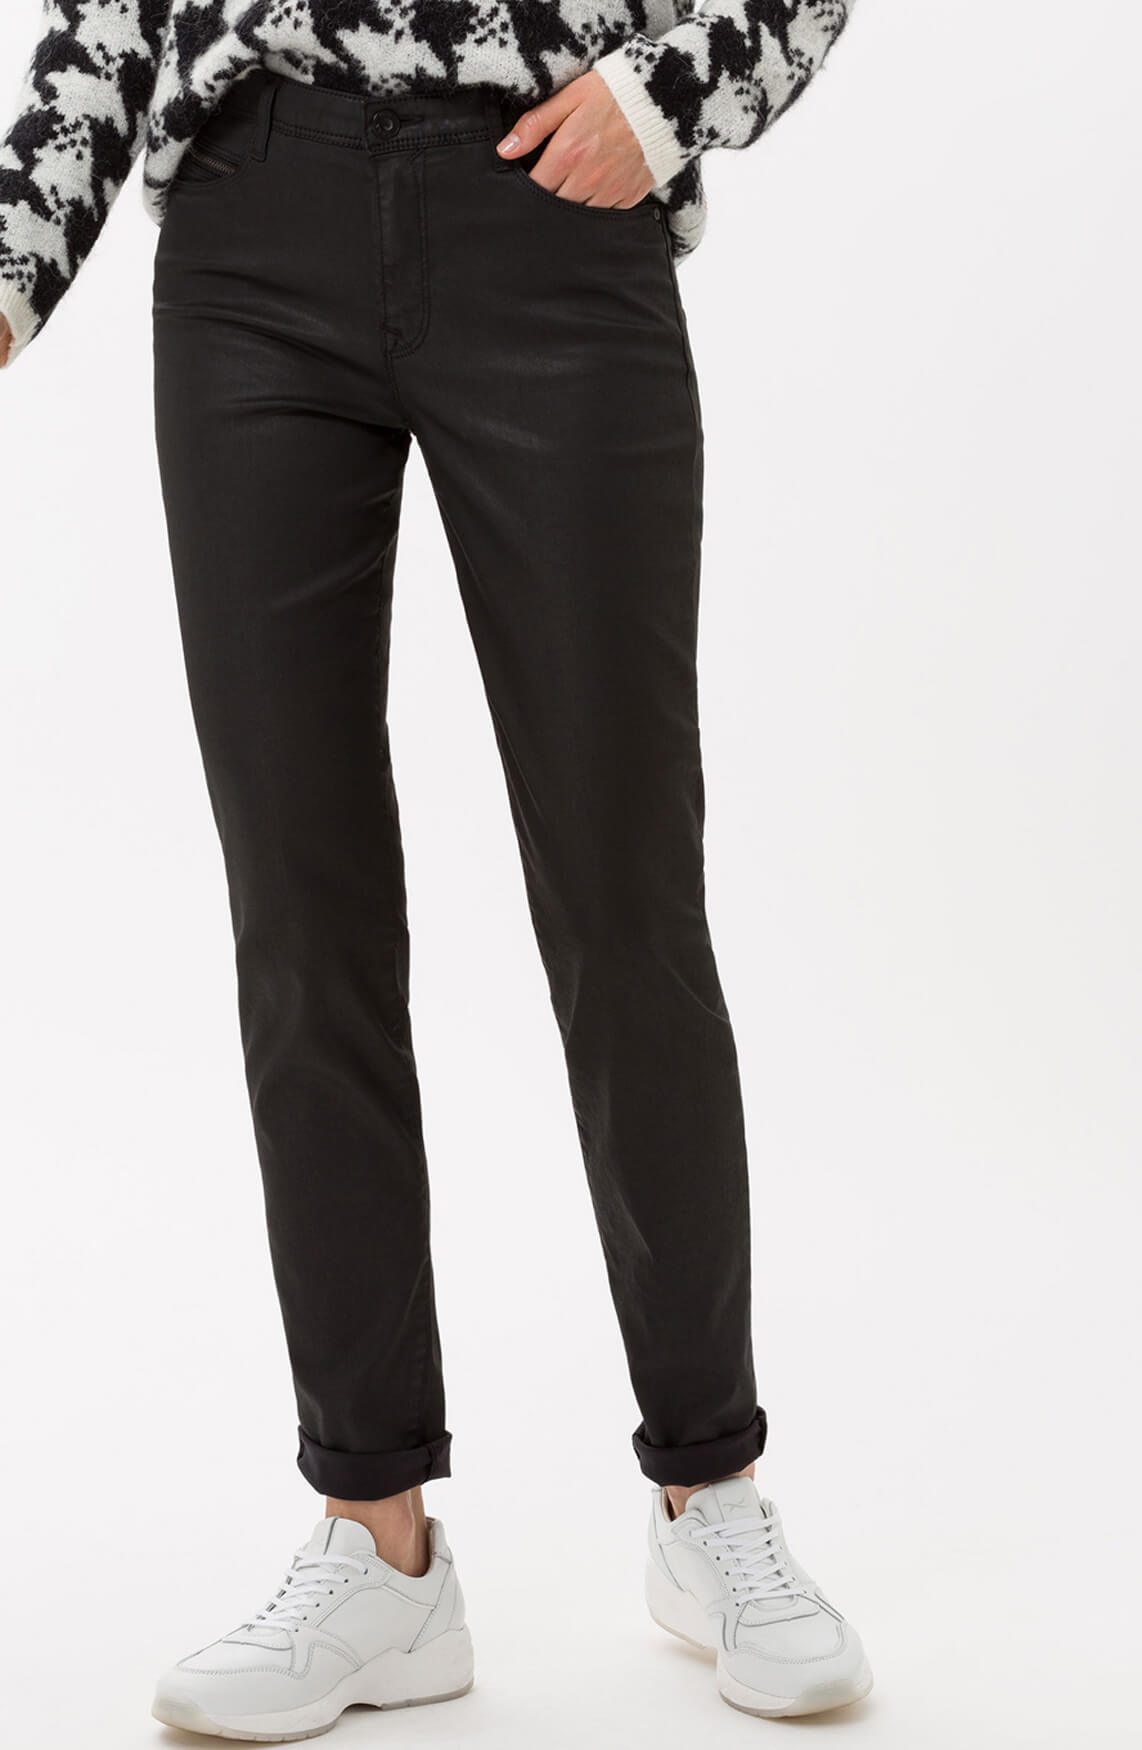 Brax Dames Shakira gecoate jeans zwart